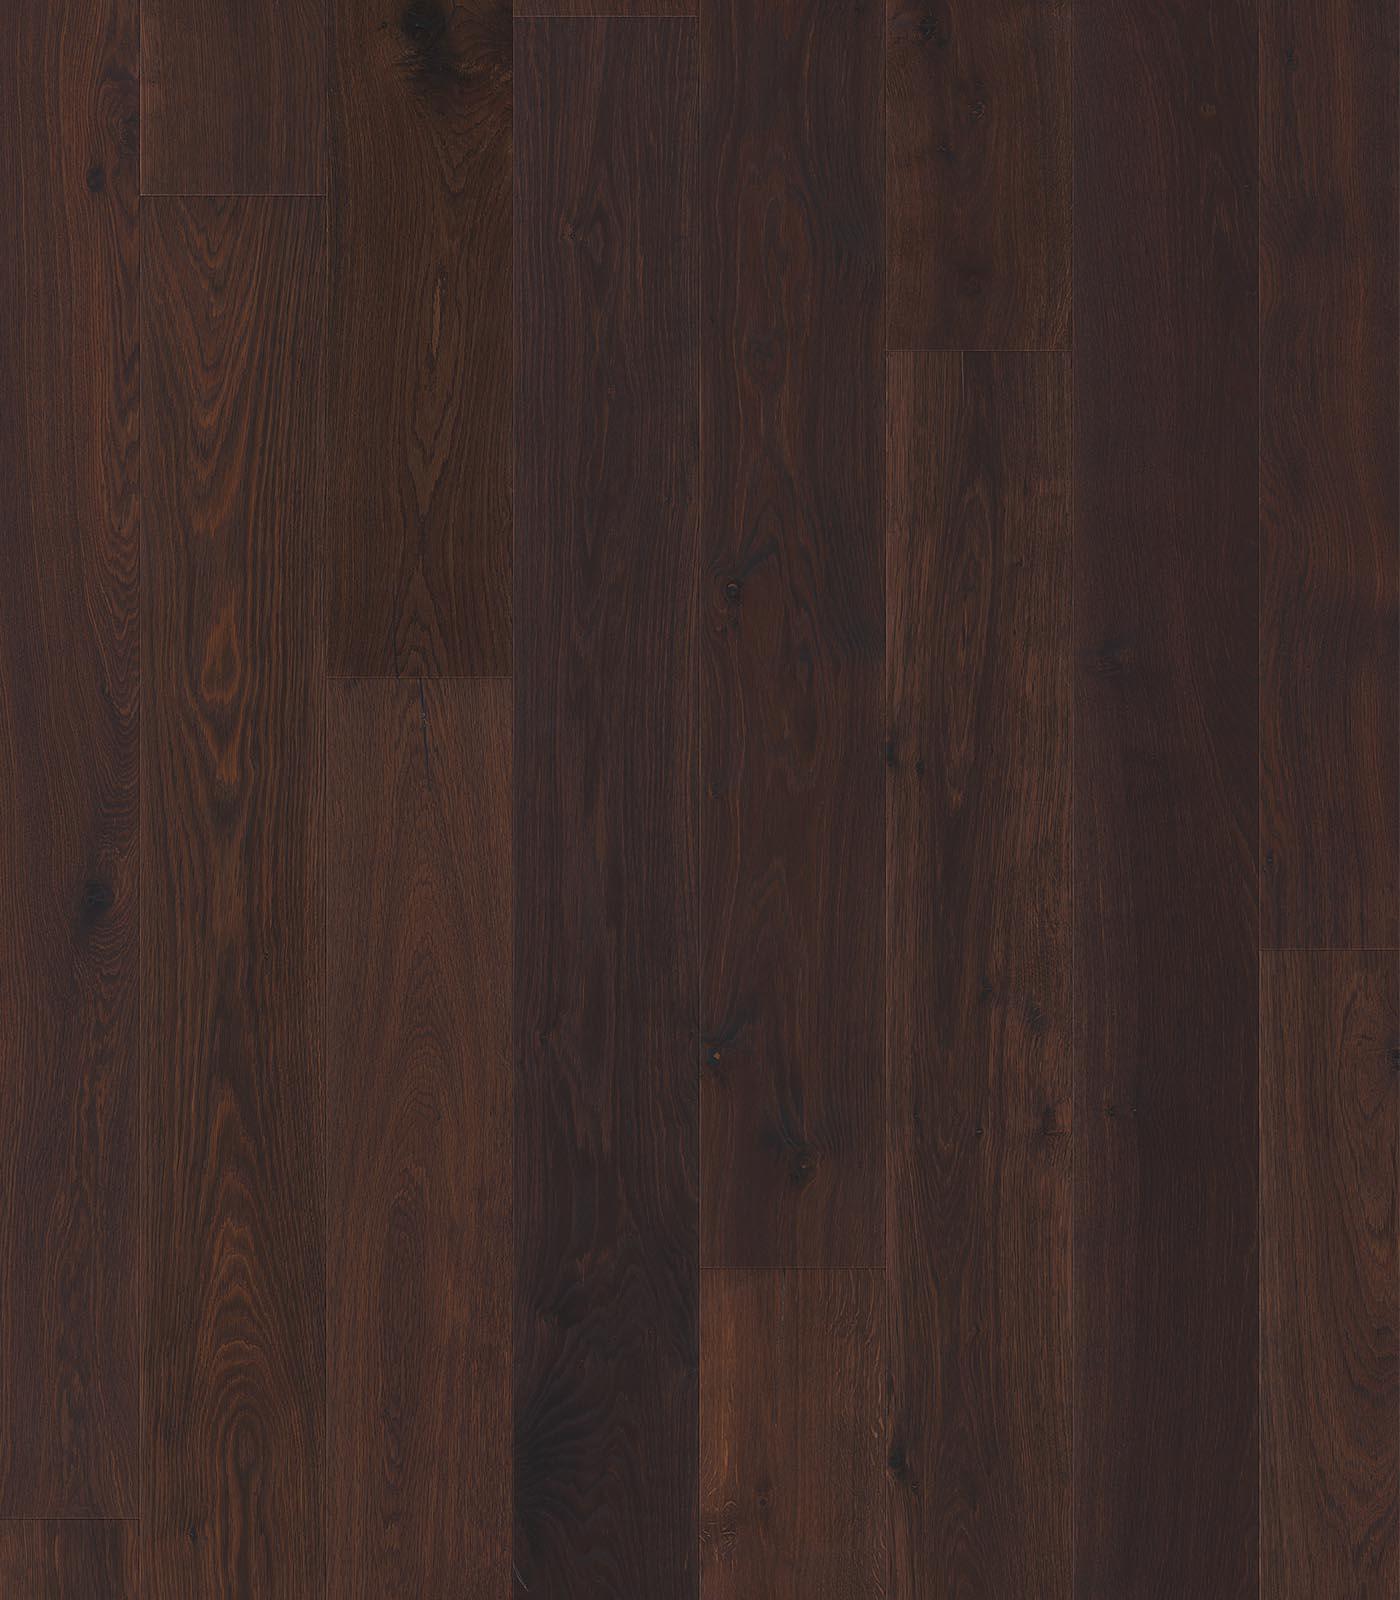 Smoked-European-Oak-floors-Origins-Collection-flat